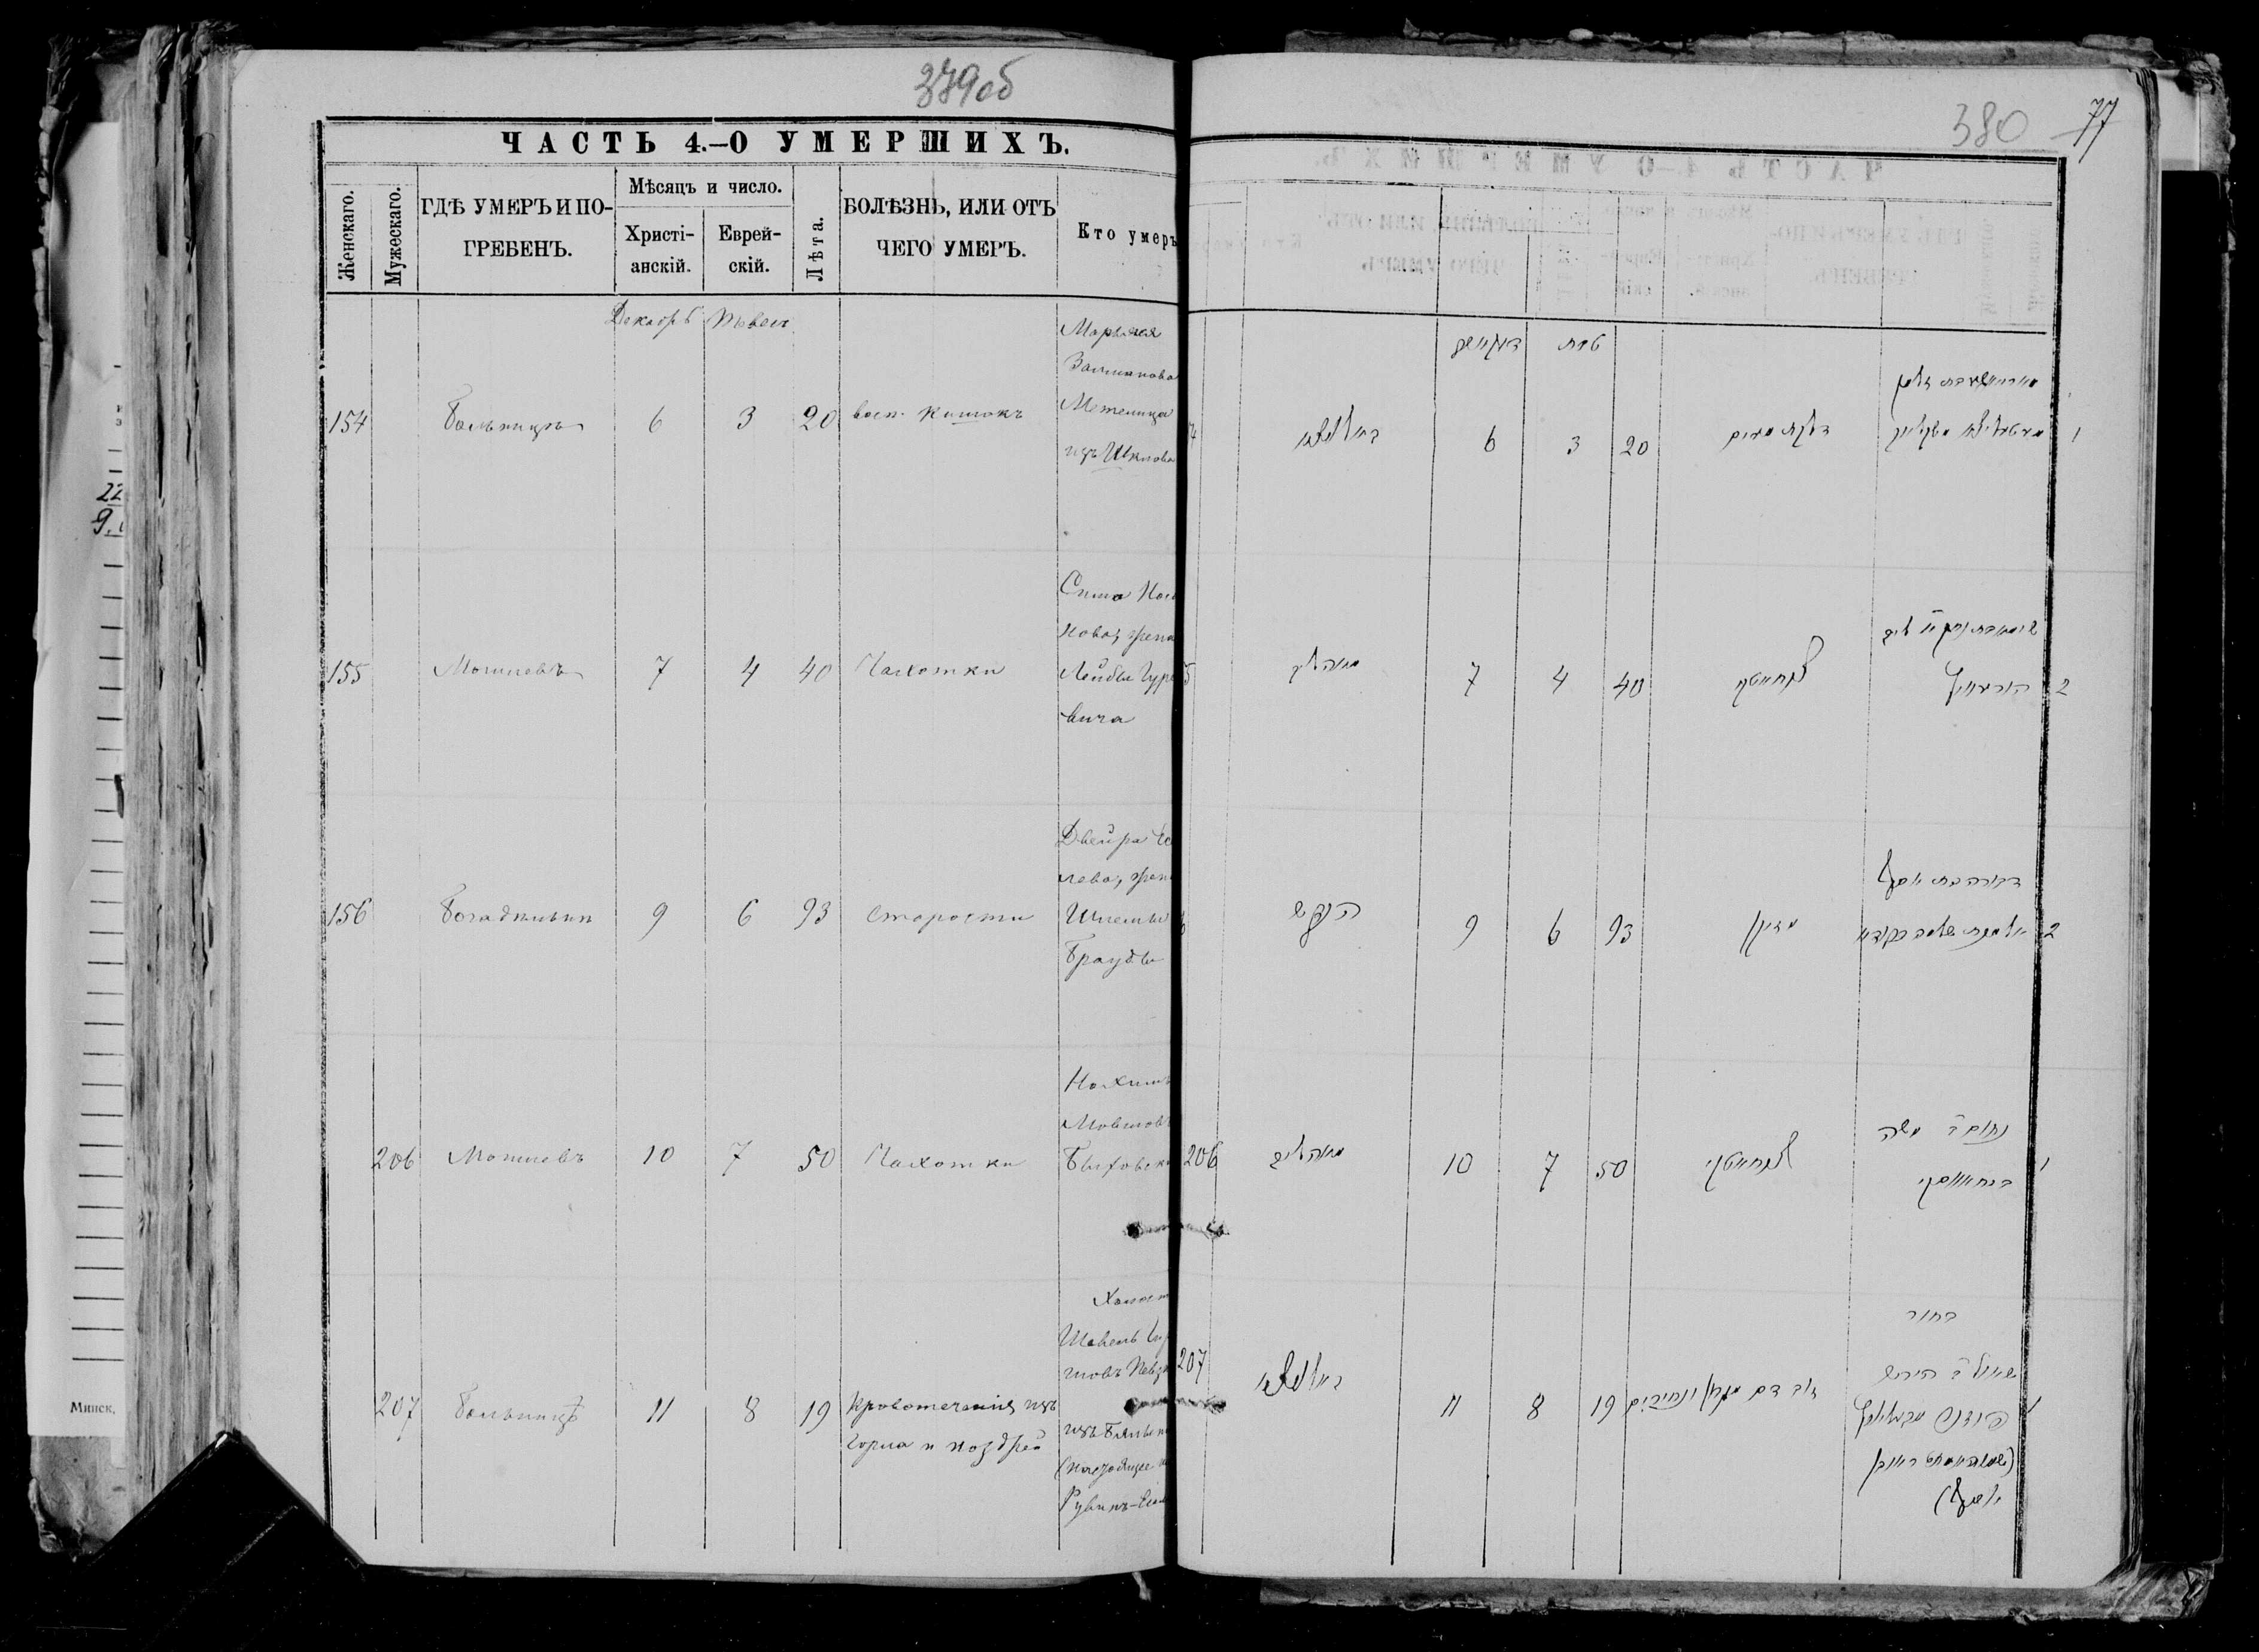 Двейра Еселевна Брауда, жена Шлемы Брауды ум. 9 декабря 1887, запись 156, пленка 004563097, внимок 502